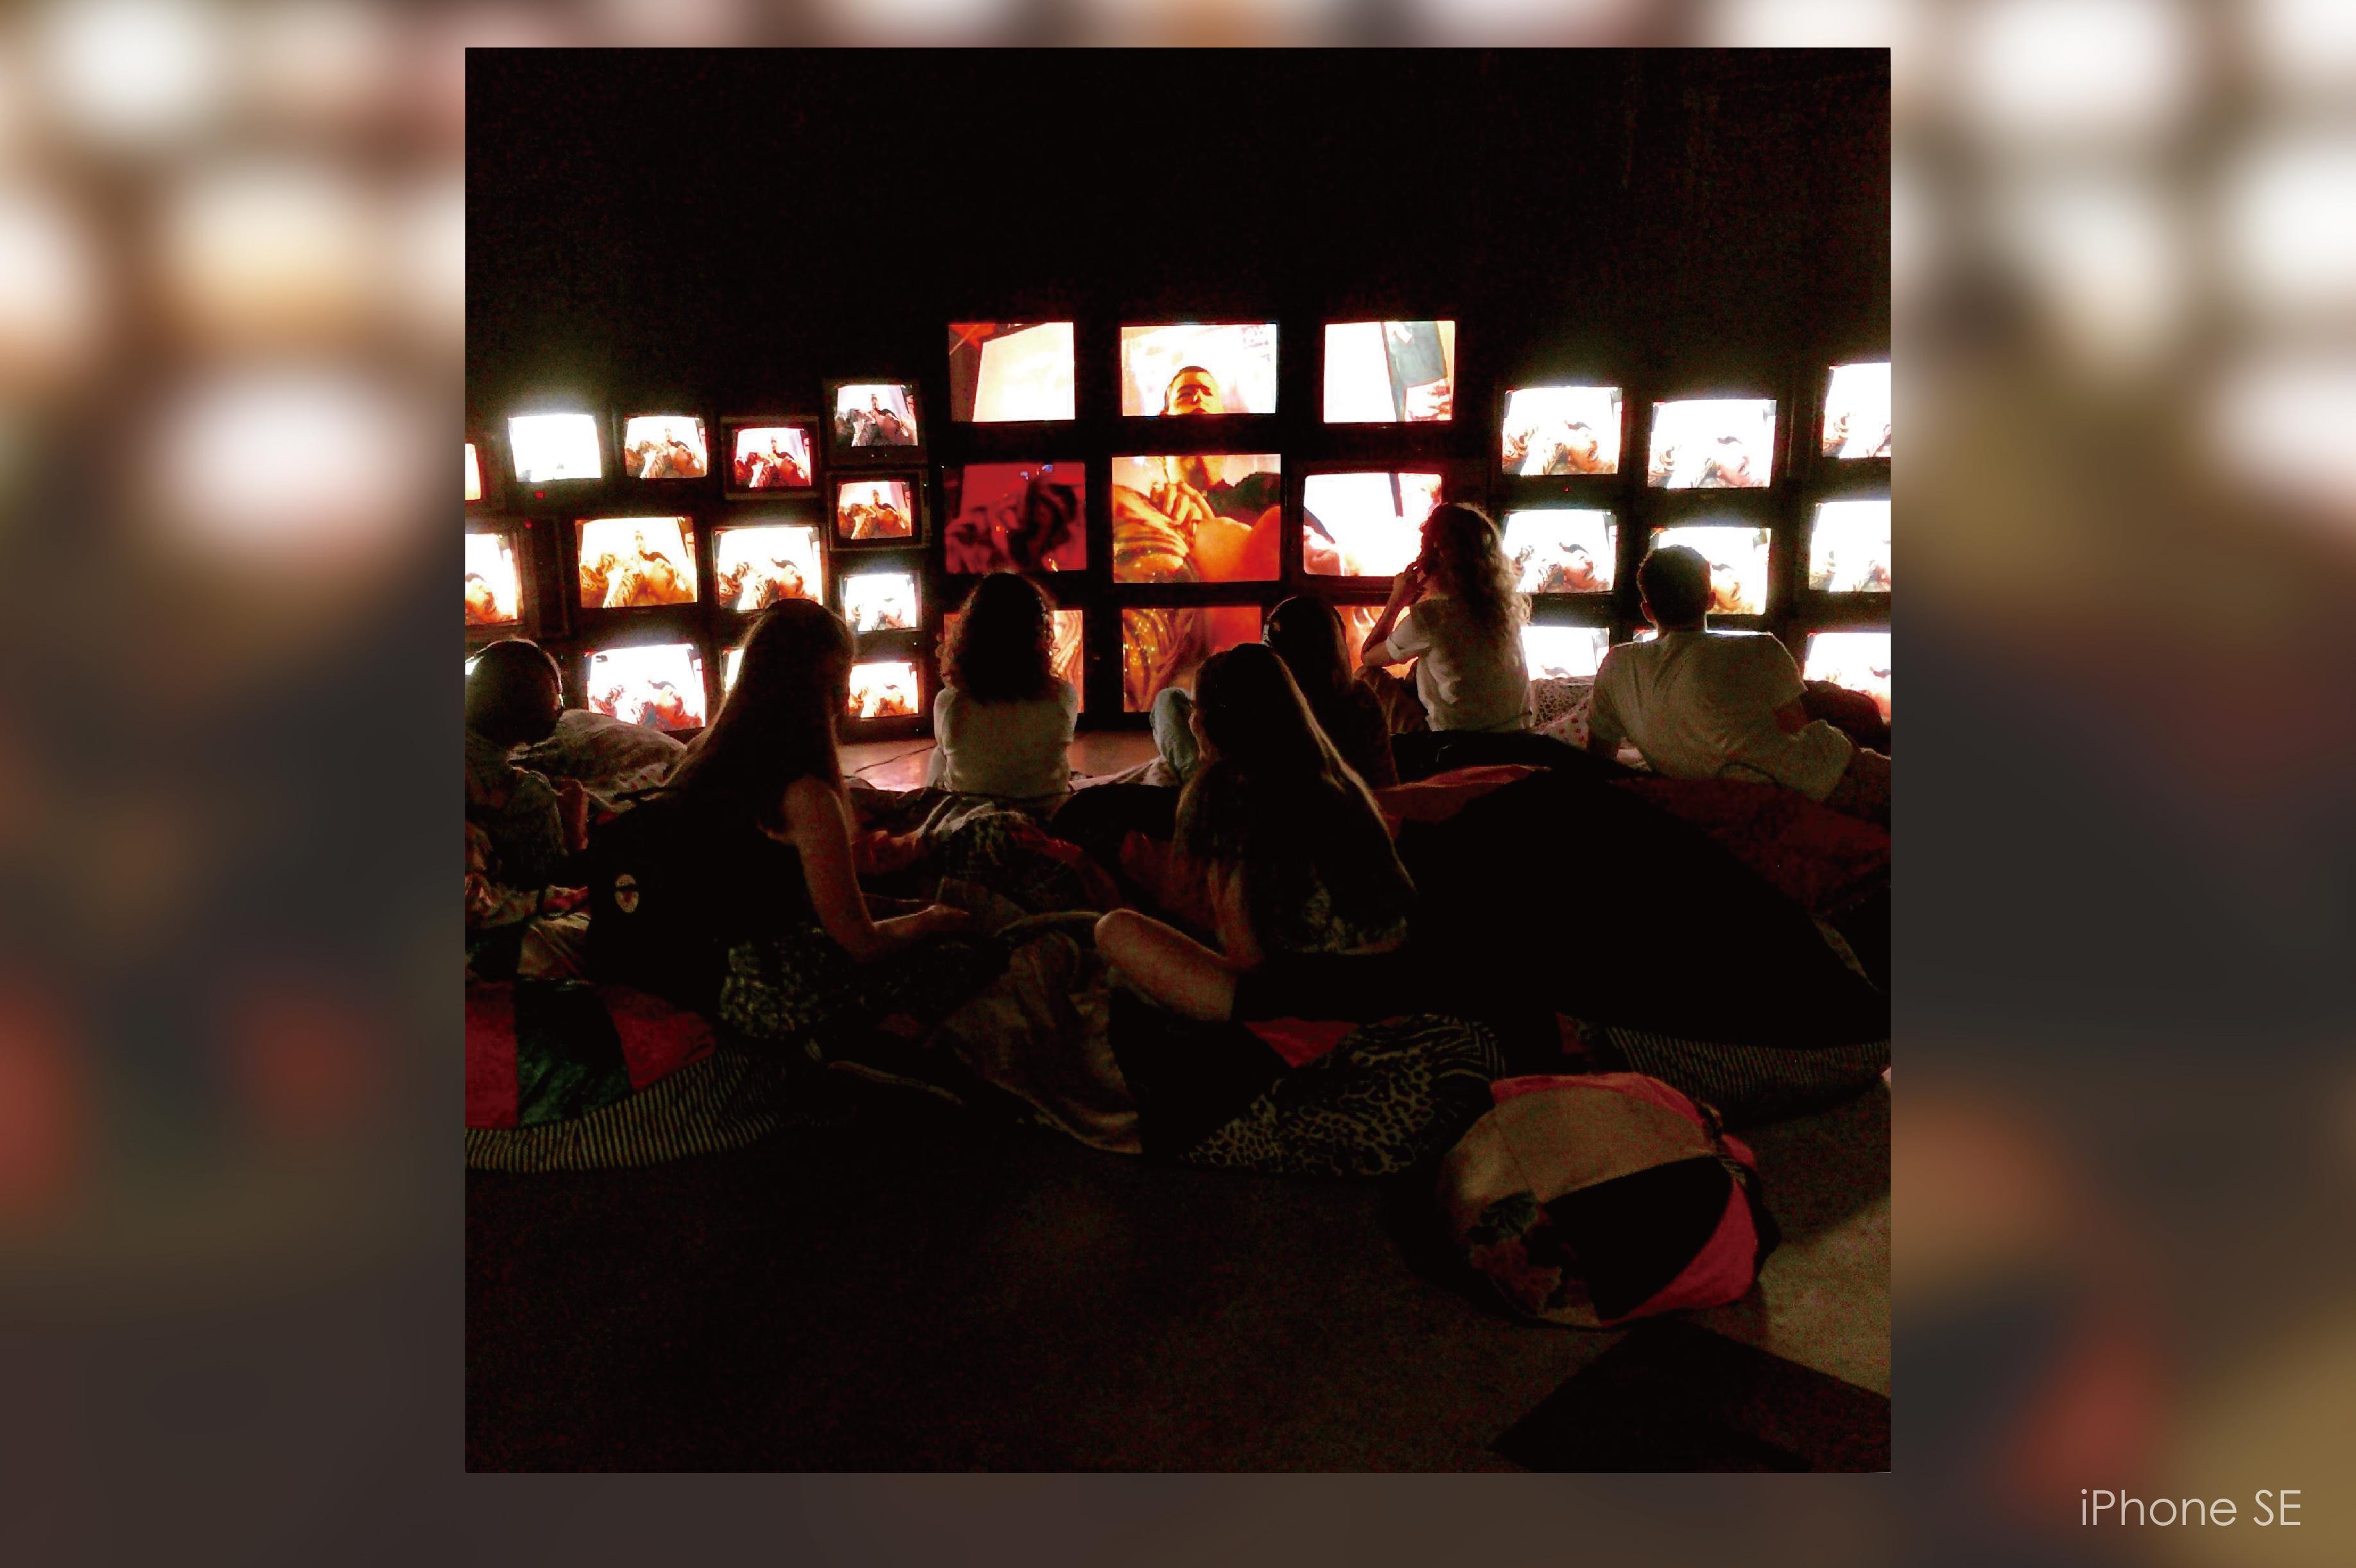 Art, Lighting, iPhone SE, iPhone, SE, lighting, night, darkness, art, iPhone SE, 藝術,照明,iPhone SE,iPhone,SE,燈光,夜晚,黑暗,藝術,iPhone SE